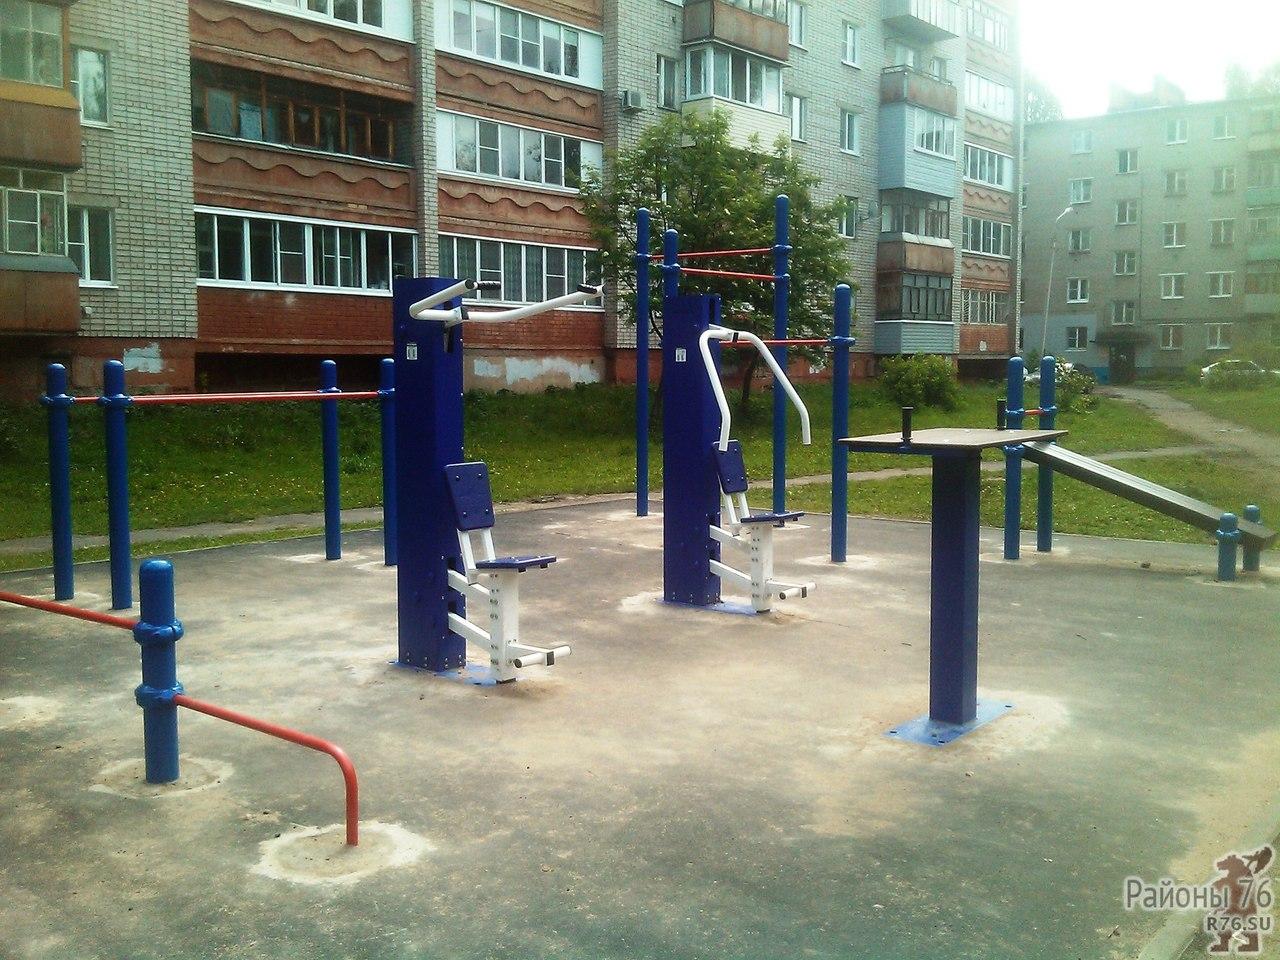 Установлена площадка для сдачи норм ГТО на Липовой горе.